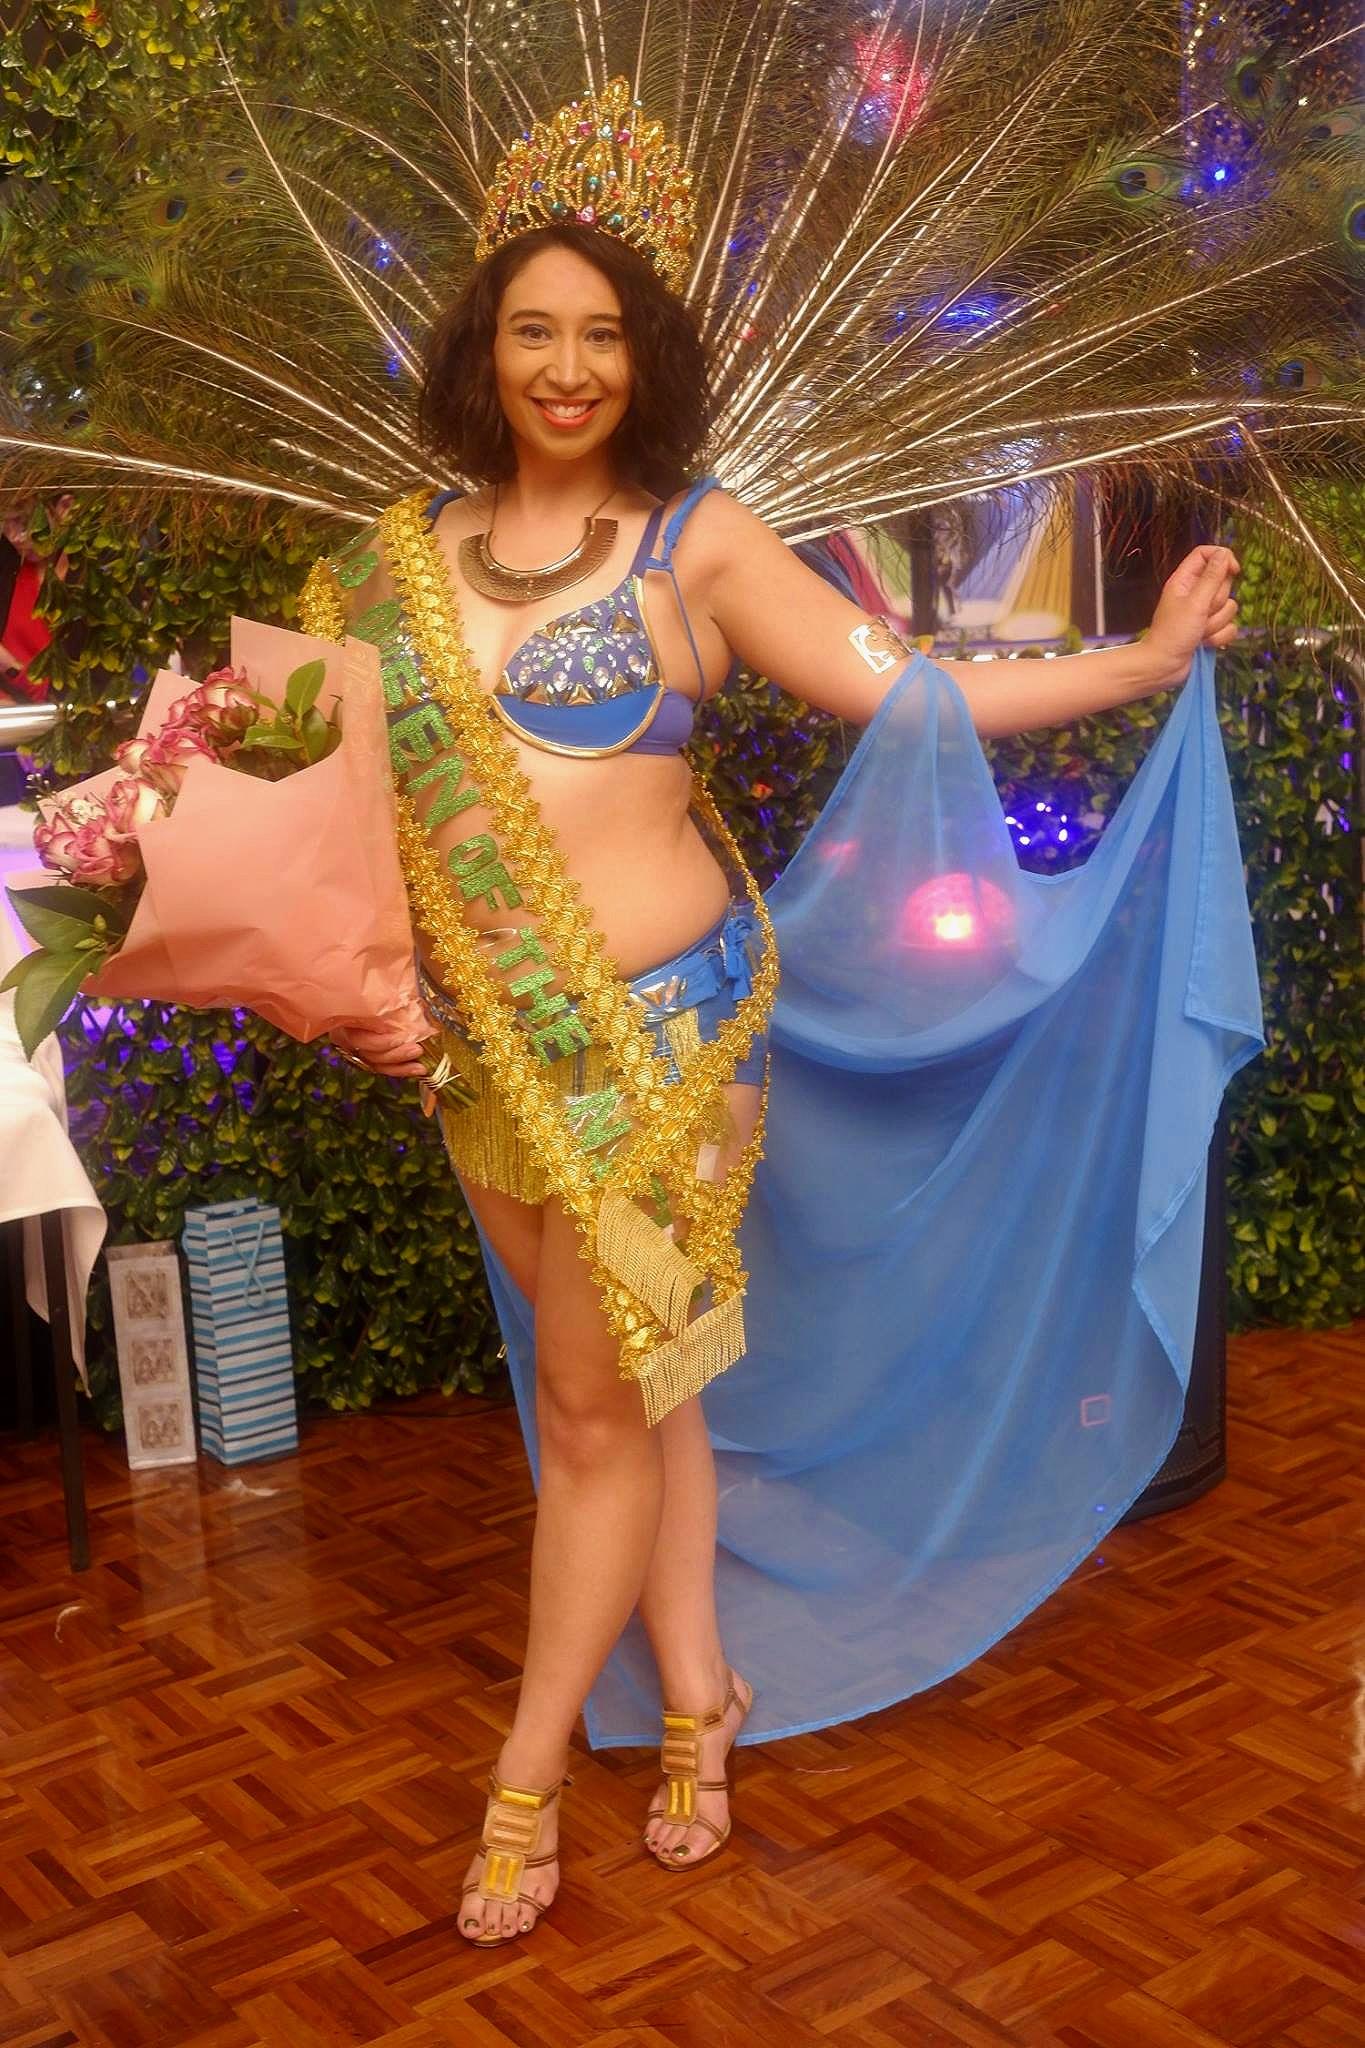 smad-rio-2019-dinner-dance-pageant-melbourne-australia-chrity-ball.jpg